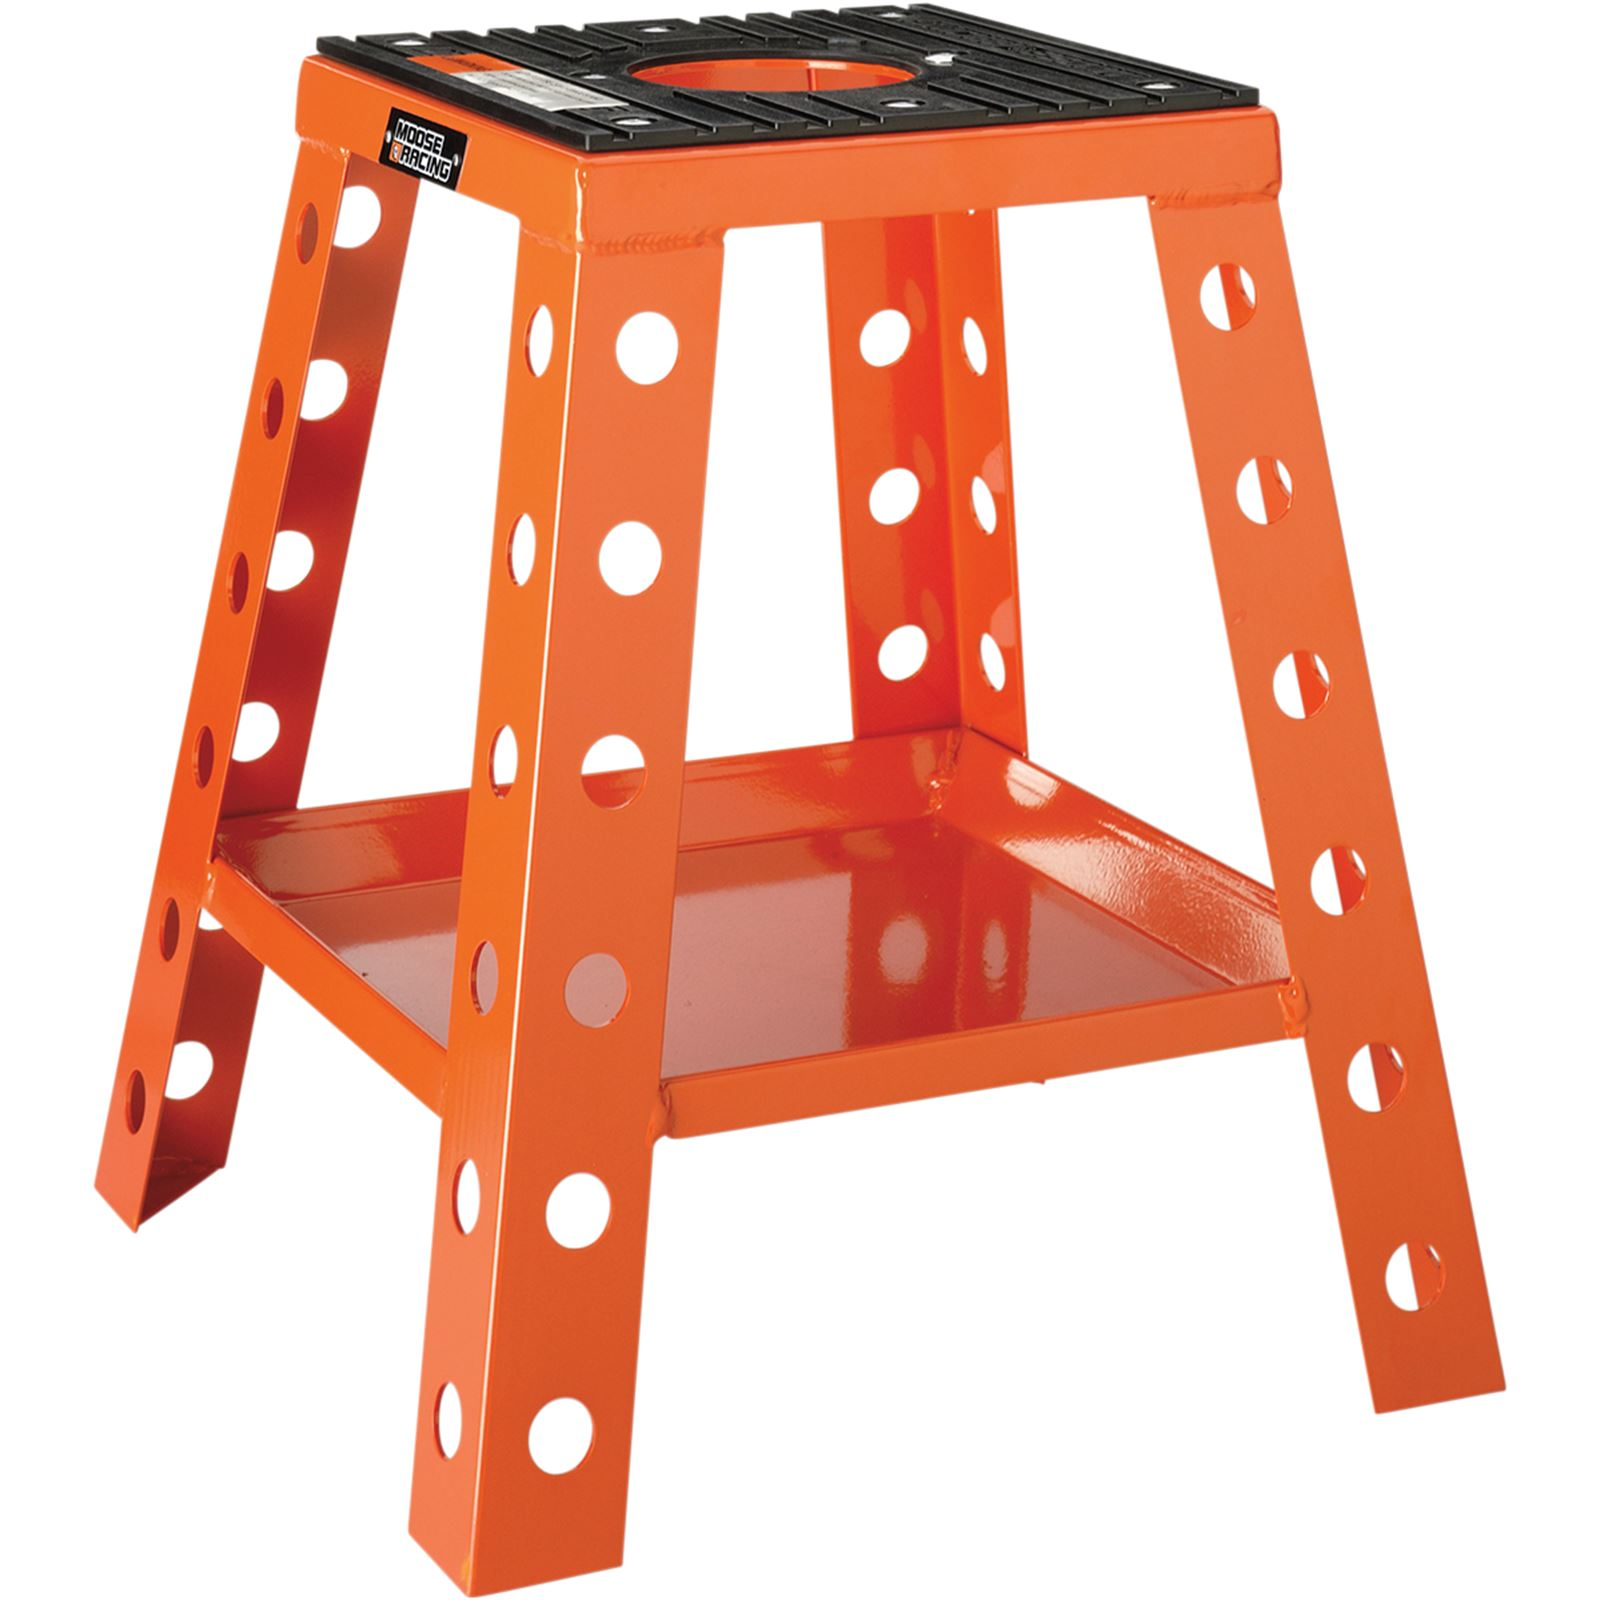 Moose Racing Bike Stand Fundamental Orange